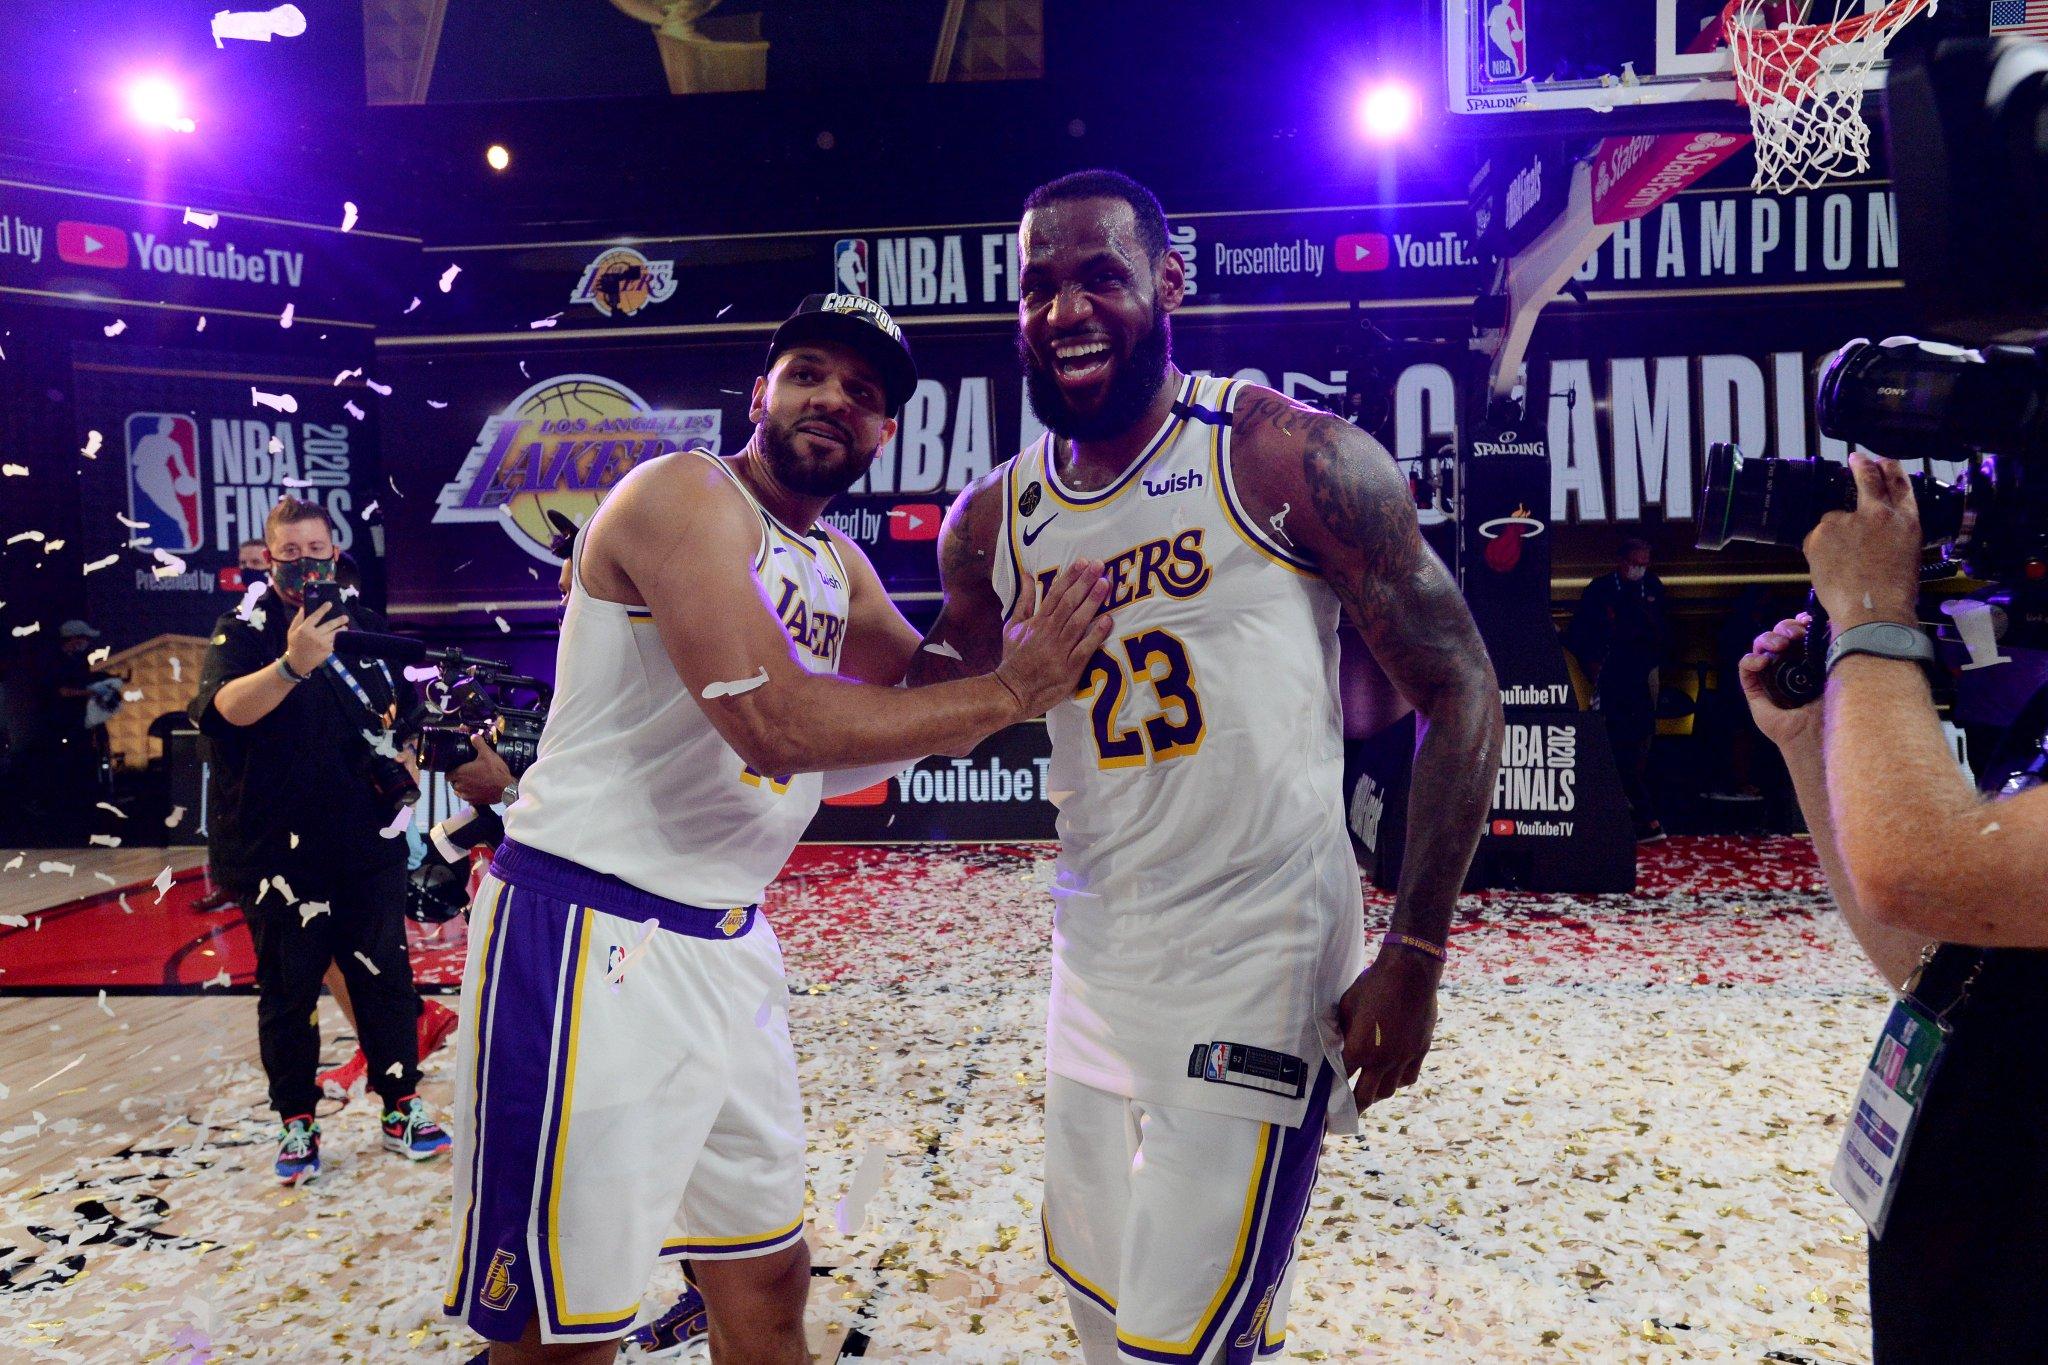 NBA LeBron Jared Dudley